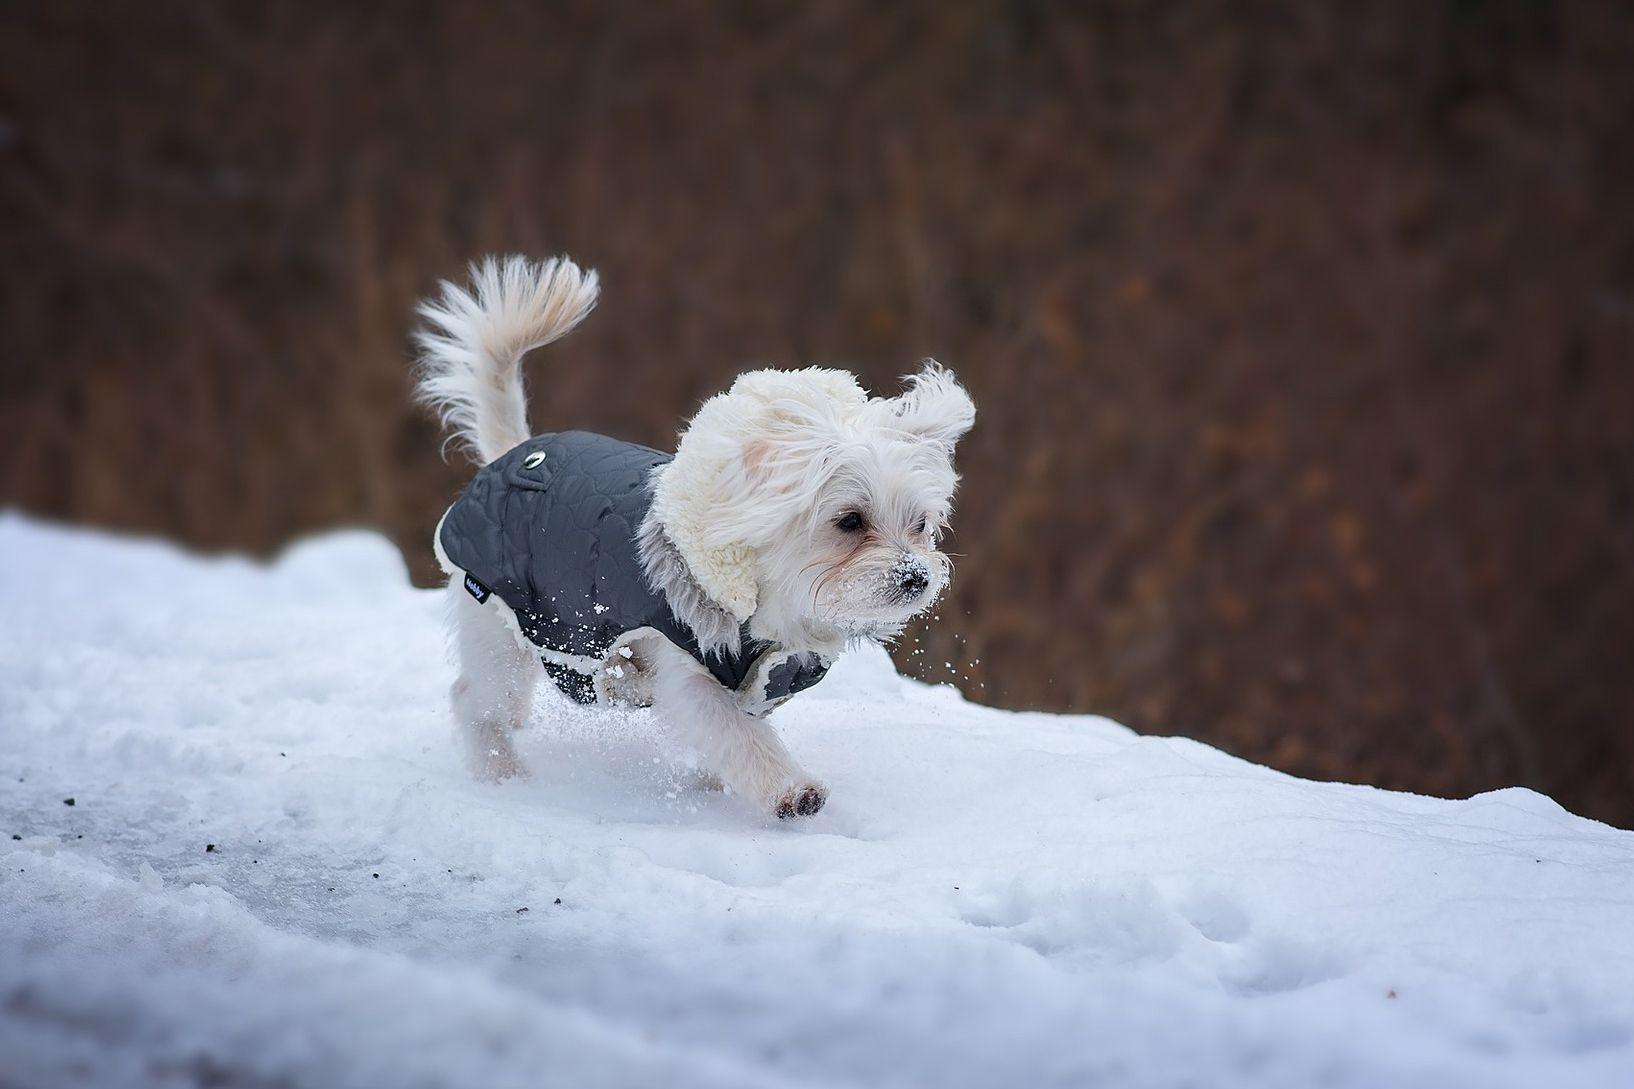 Free sewing pattern for a warm weatherproof dog coat jeuxipadfo Images